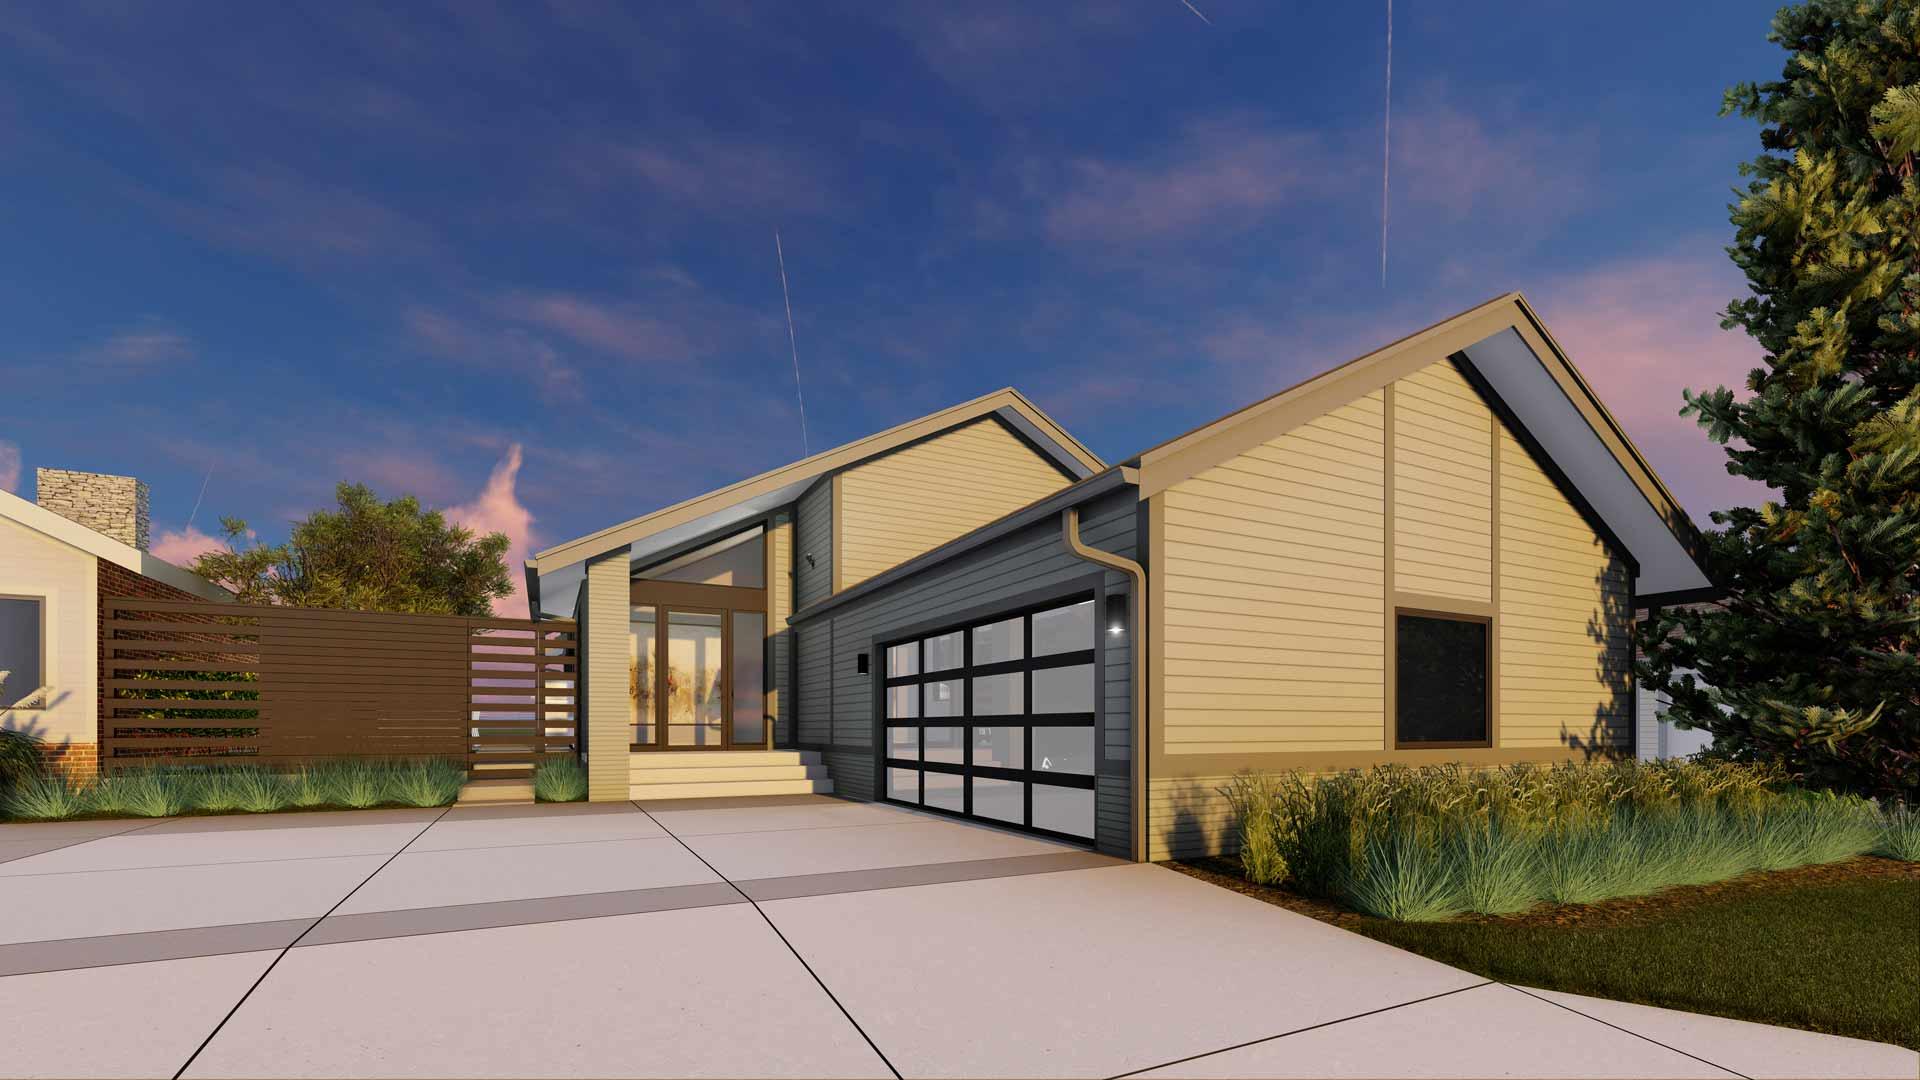 Rendering - Street View - Modern Lakehouse Renovation - Clearwater